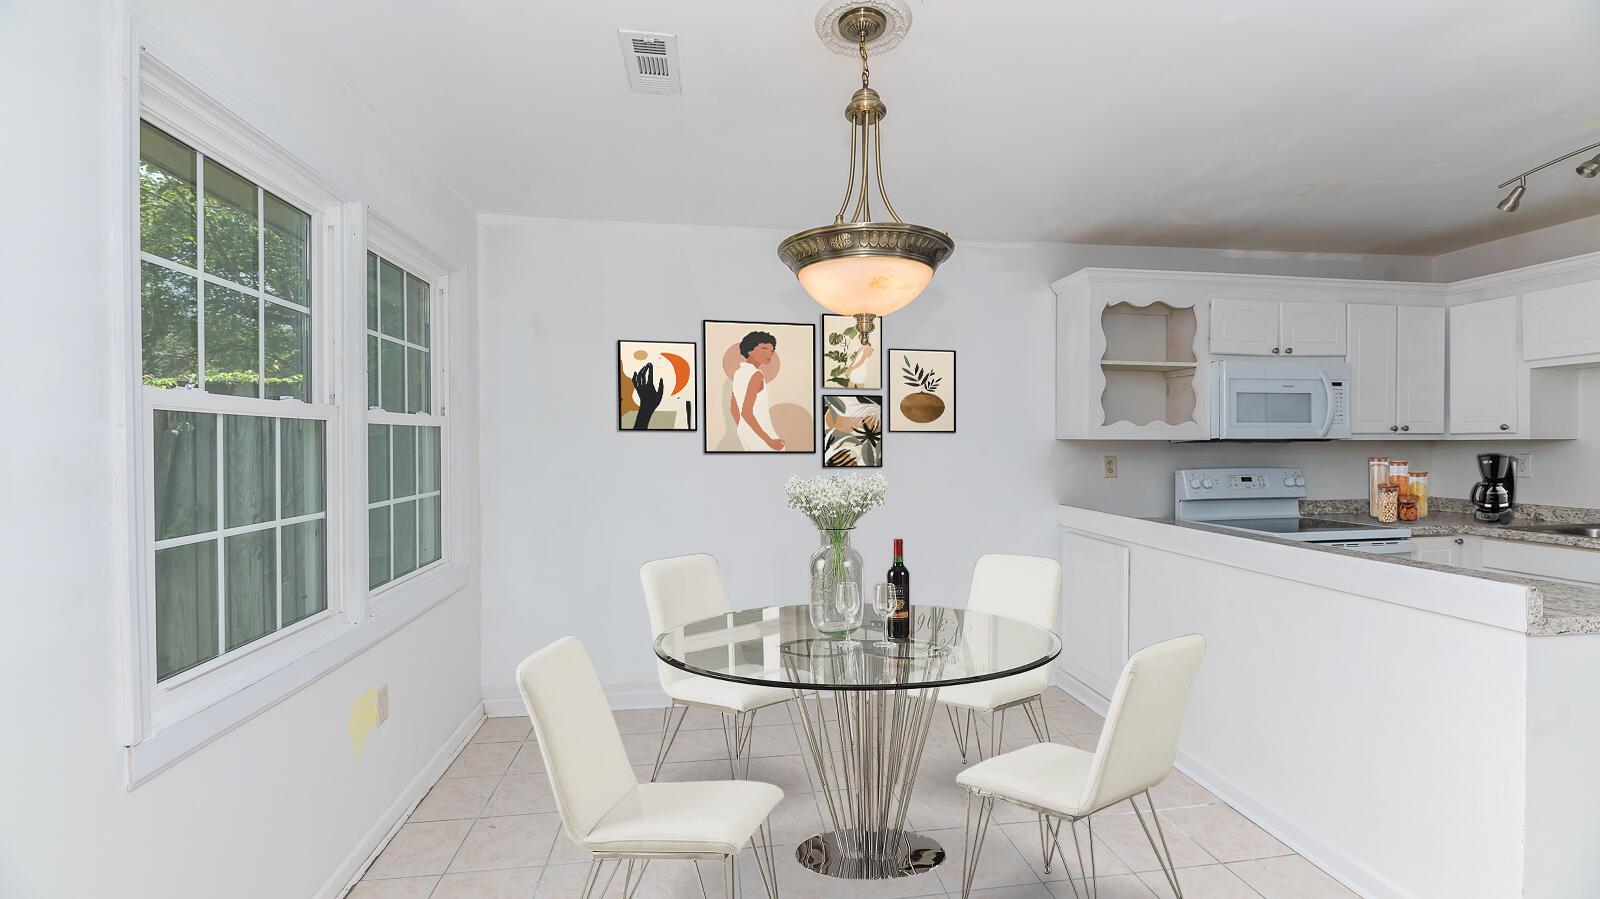 Ashley Villas Homes For Sale - 4315 Briarstone, North Charleston, SC - 25